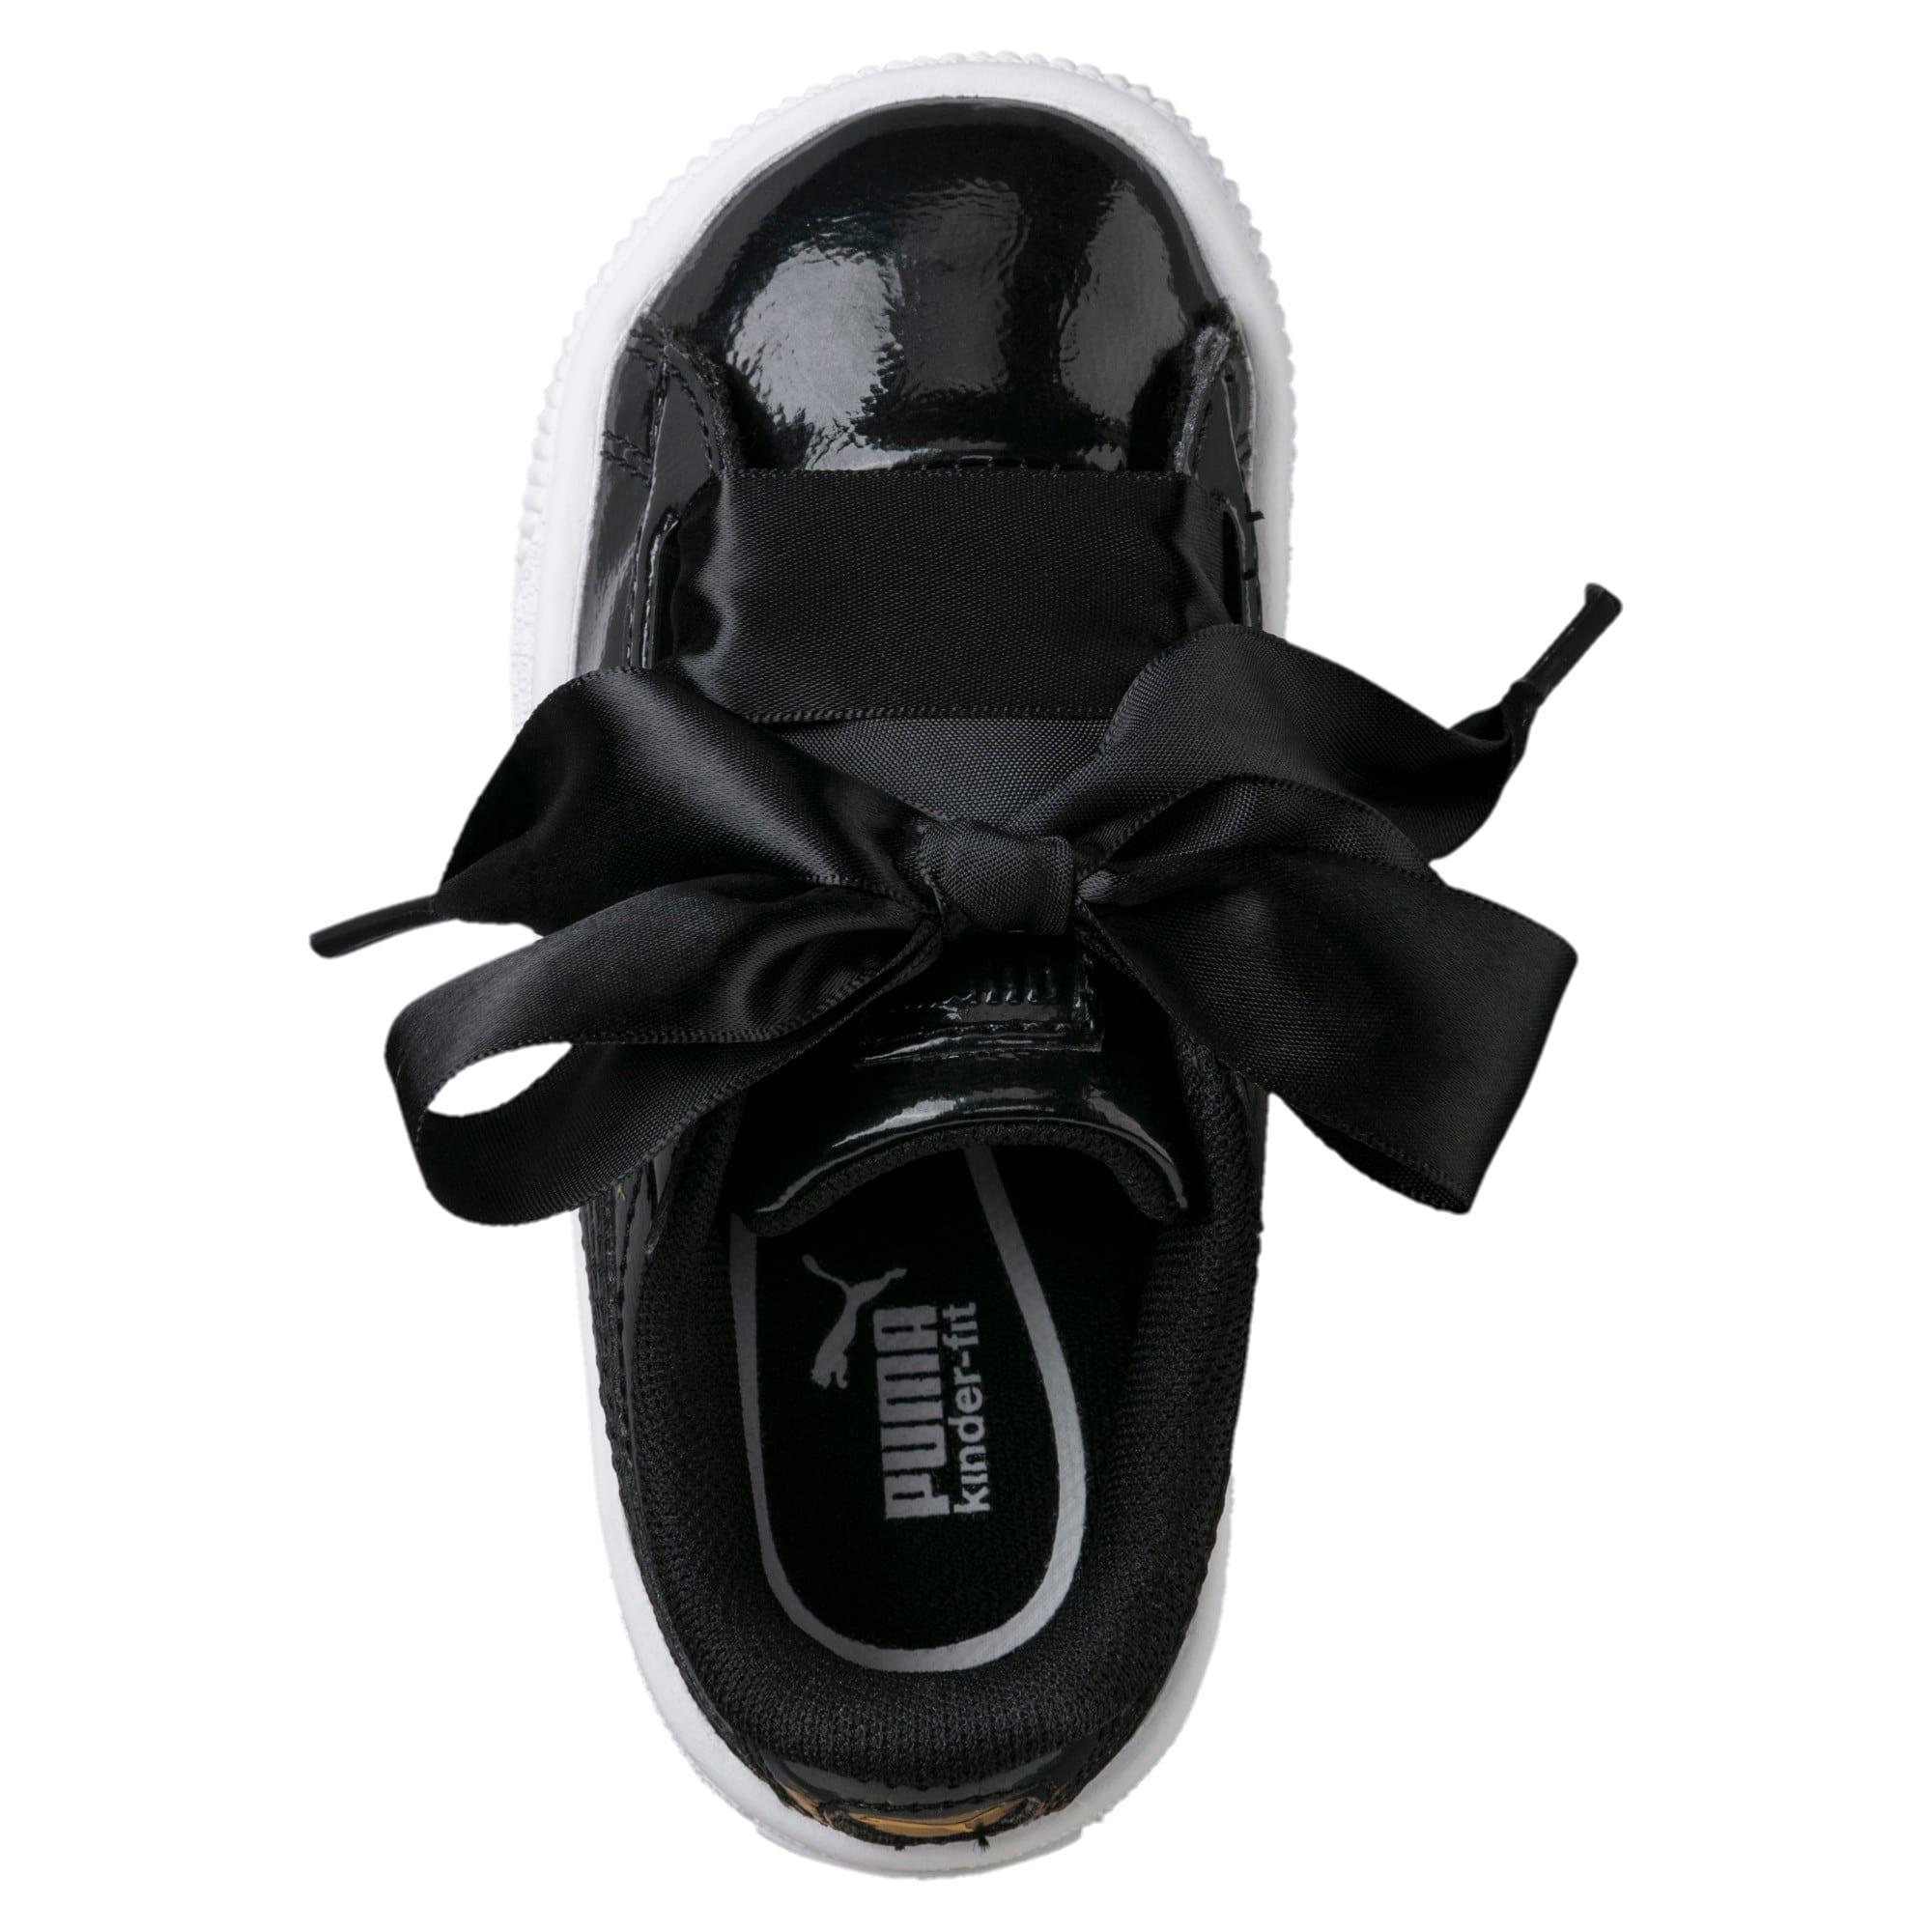 Thumbnail 5 of Basket Heart Glam Girls' Shoes, Puma Black-Puma Black, medium